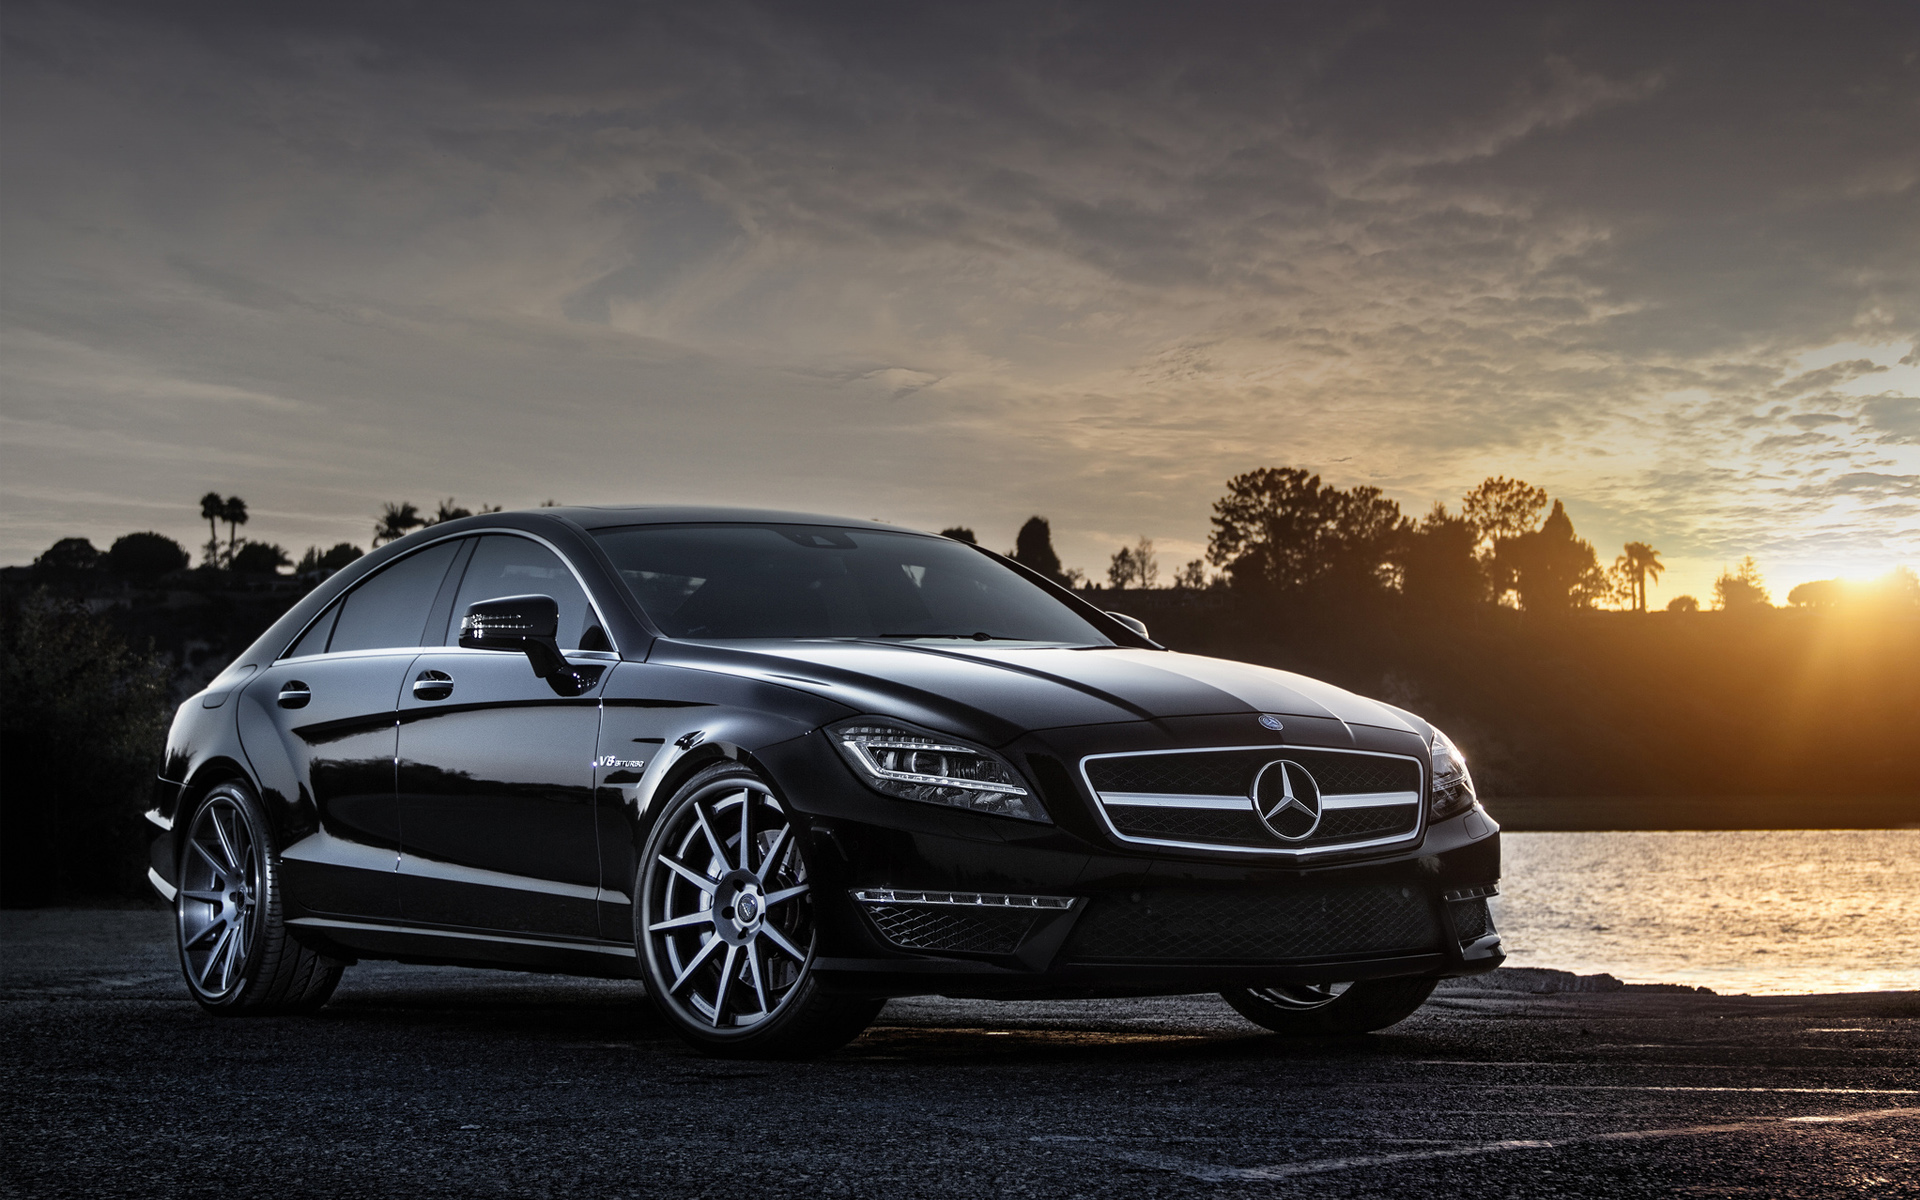 Vorsteiner For Mercedes Benz Wallpaper Hd Car Wallpapers